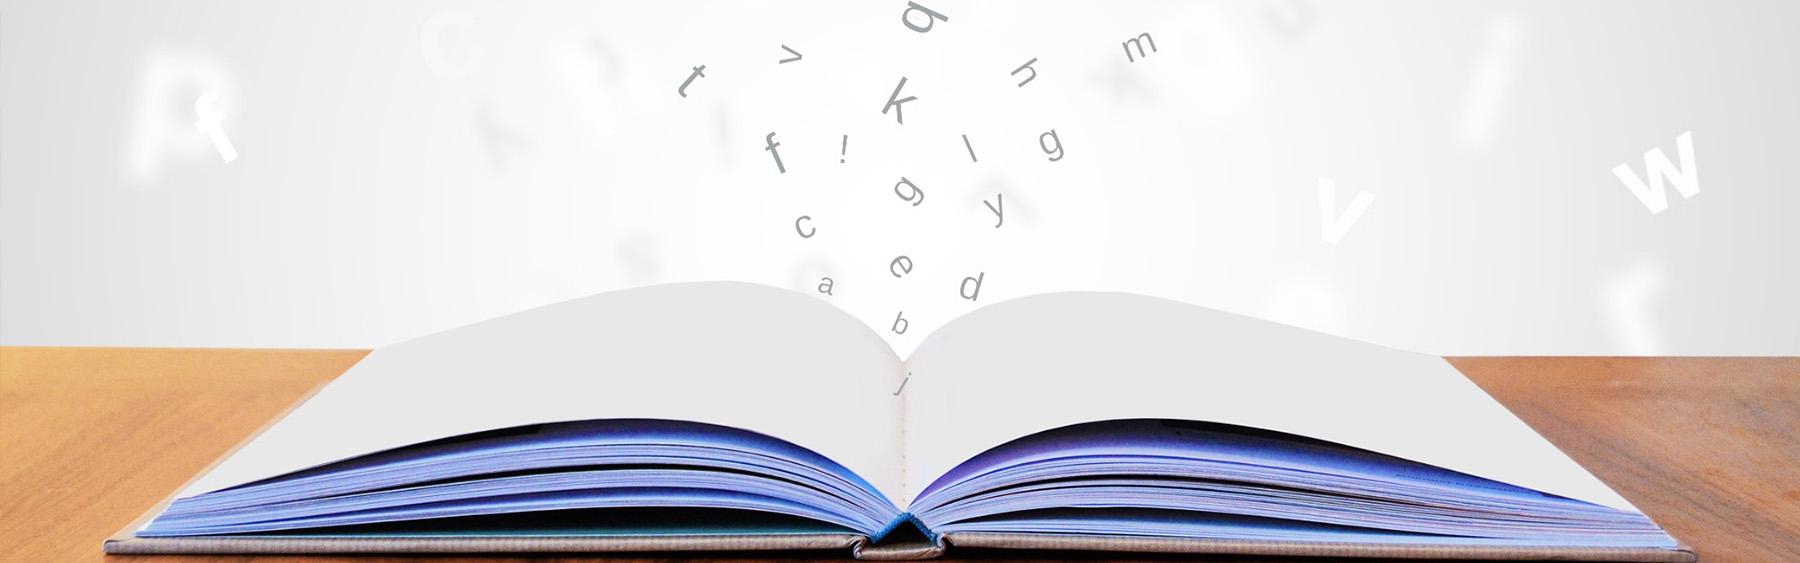 Open Textbooks Response